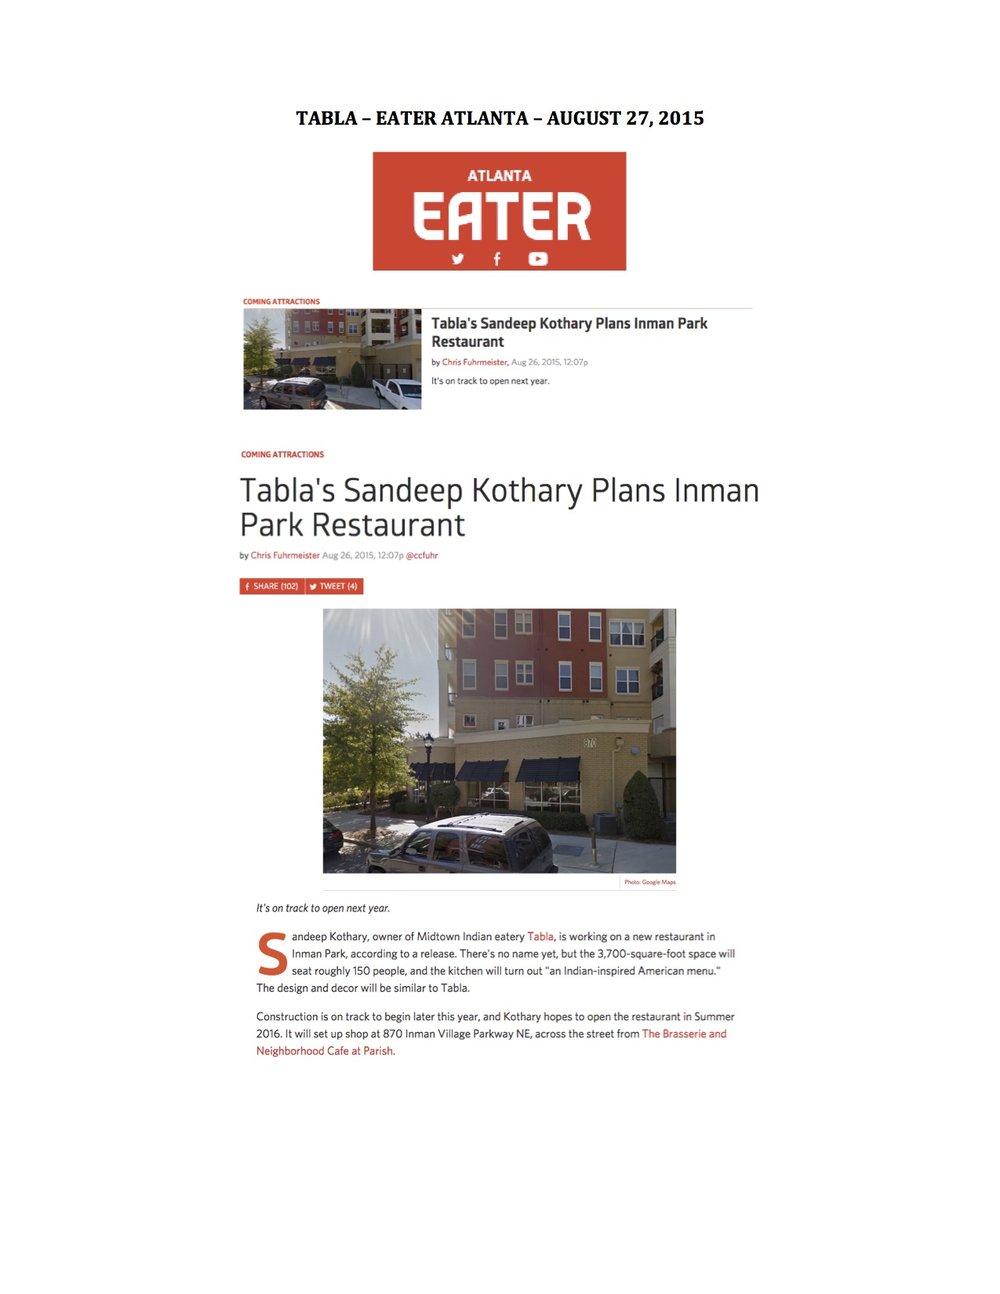 08.26.15 - Tabla - Eater Atlanta.jpg